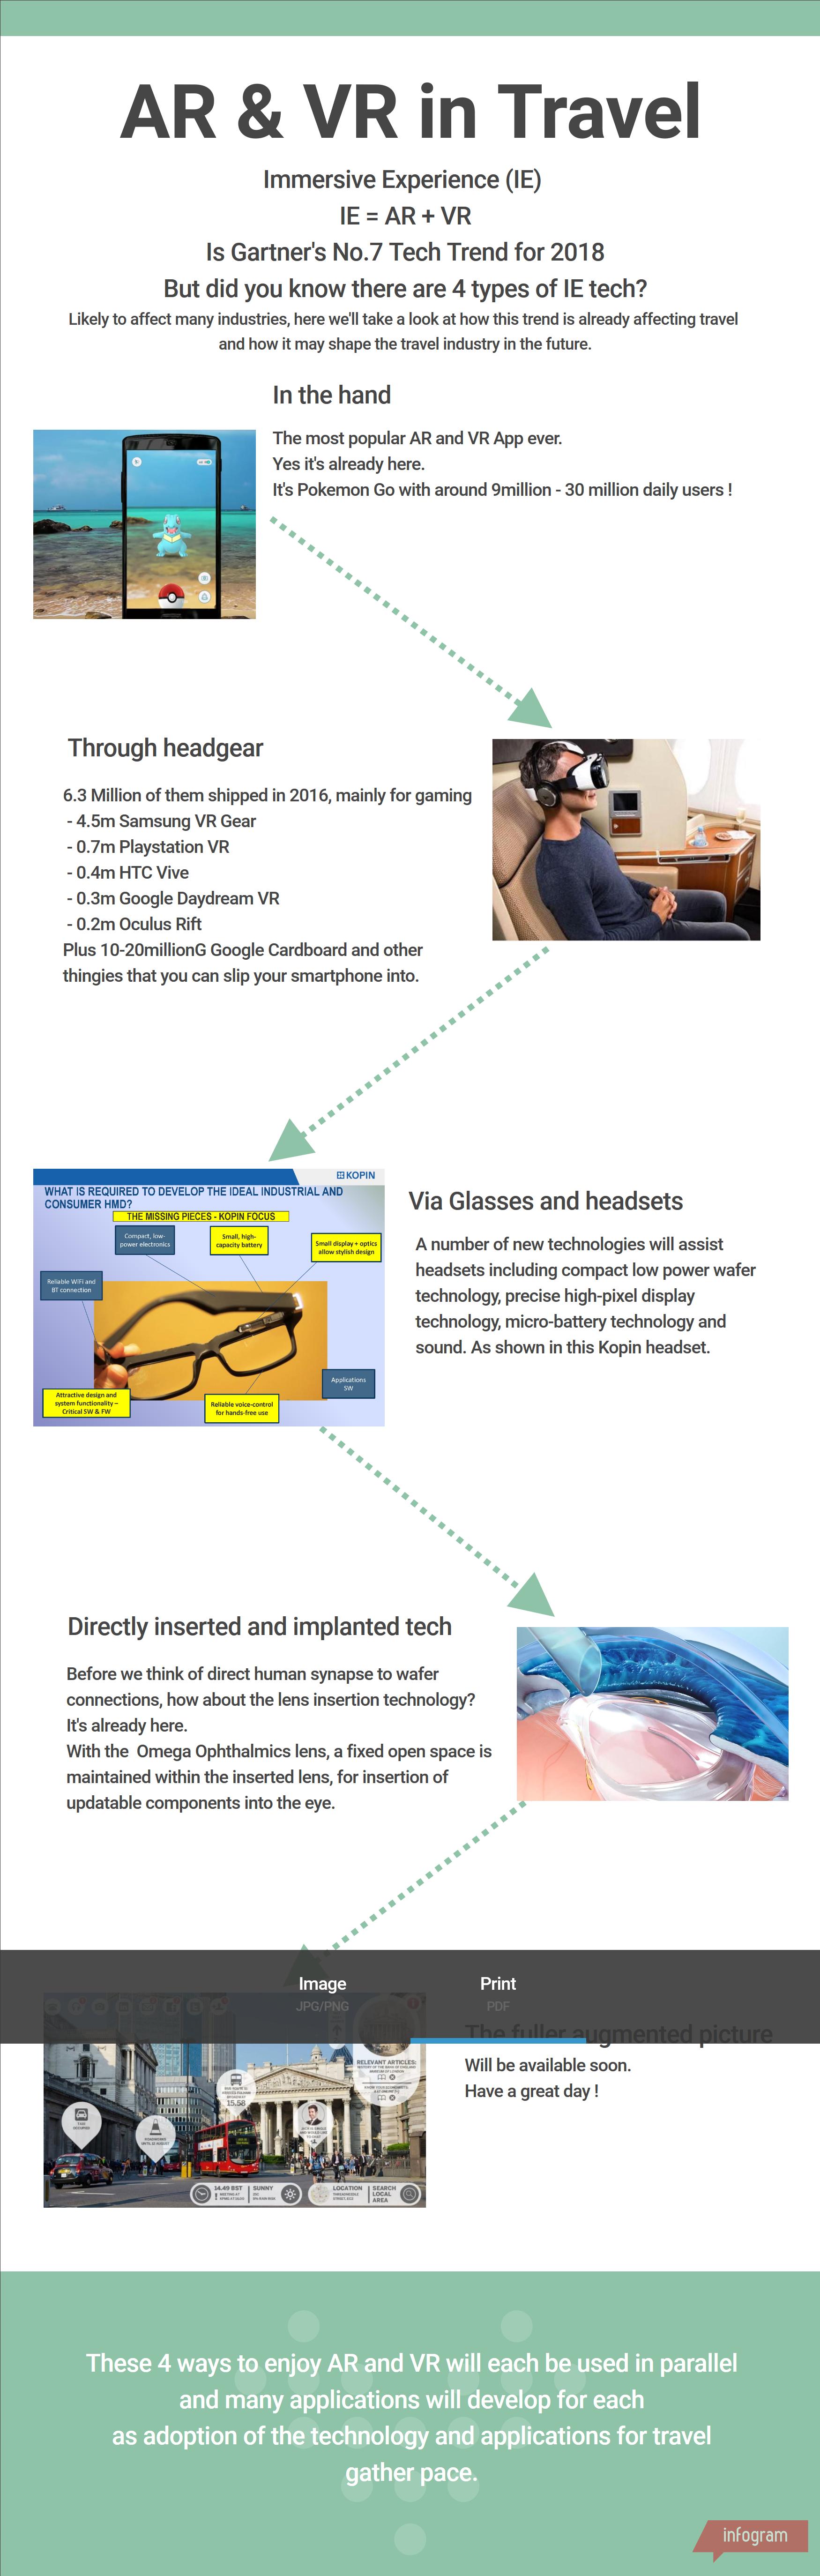 AR VR Travel - SG